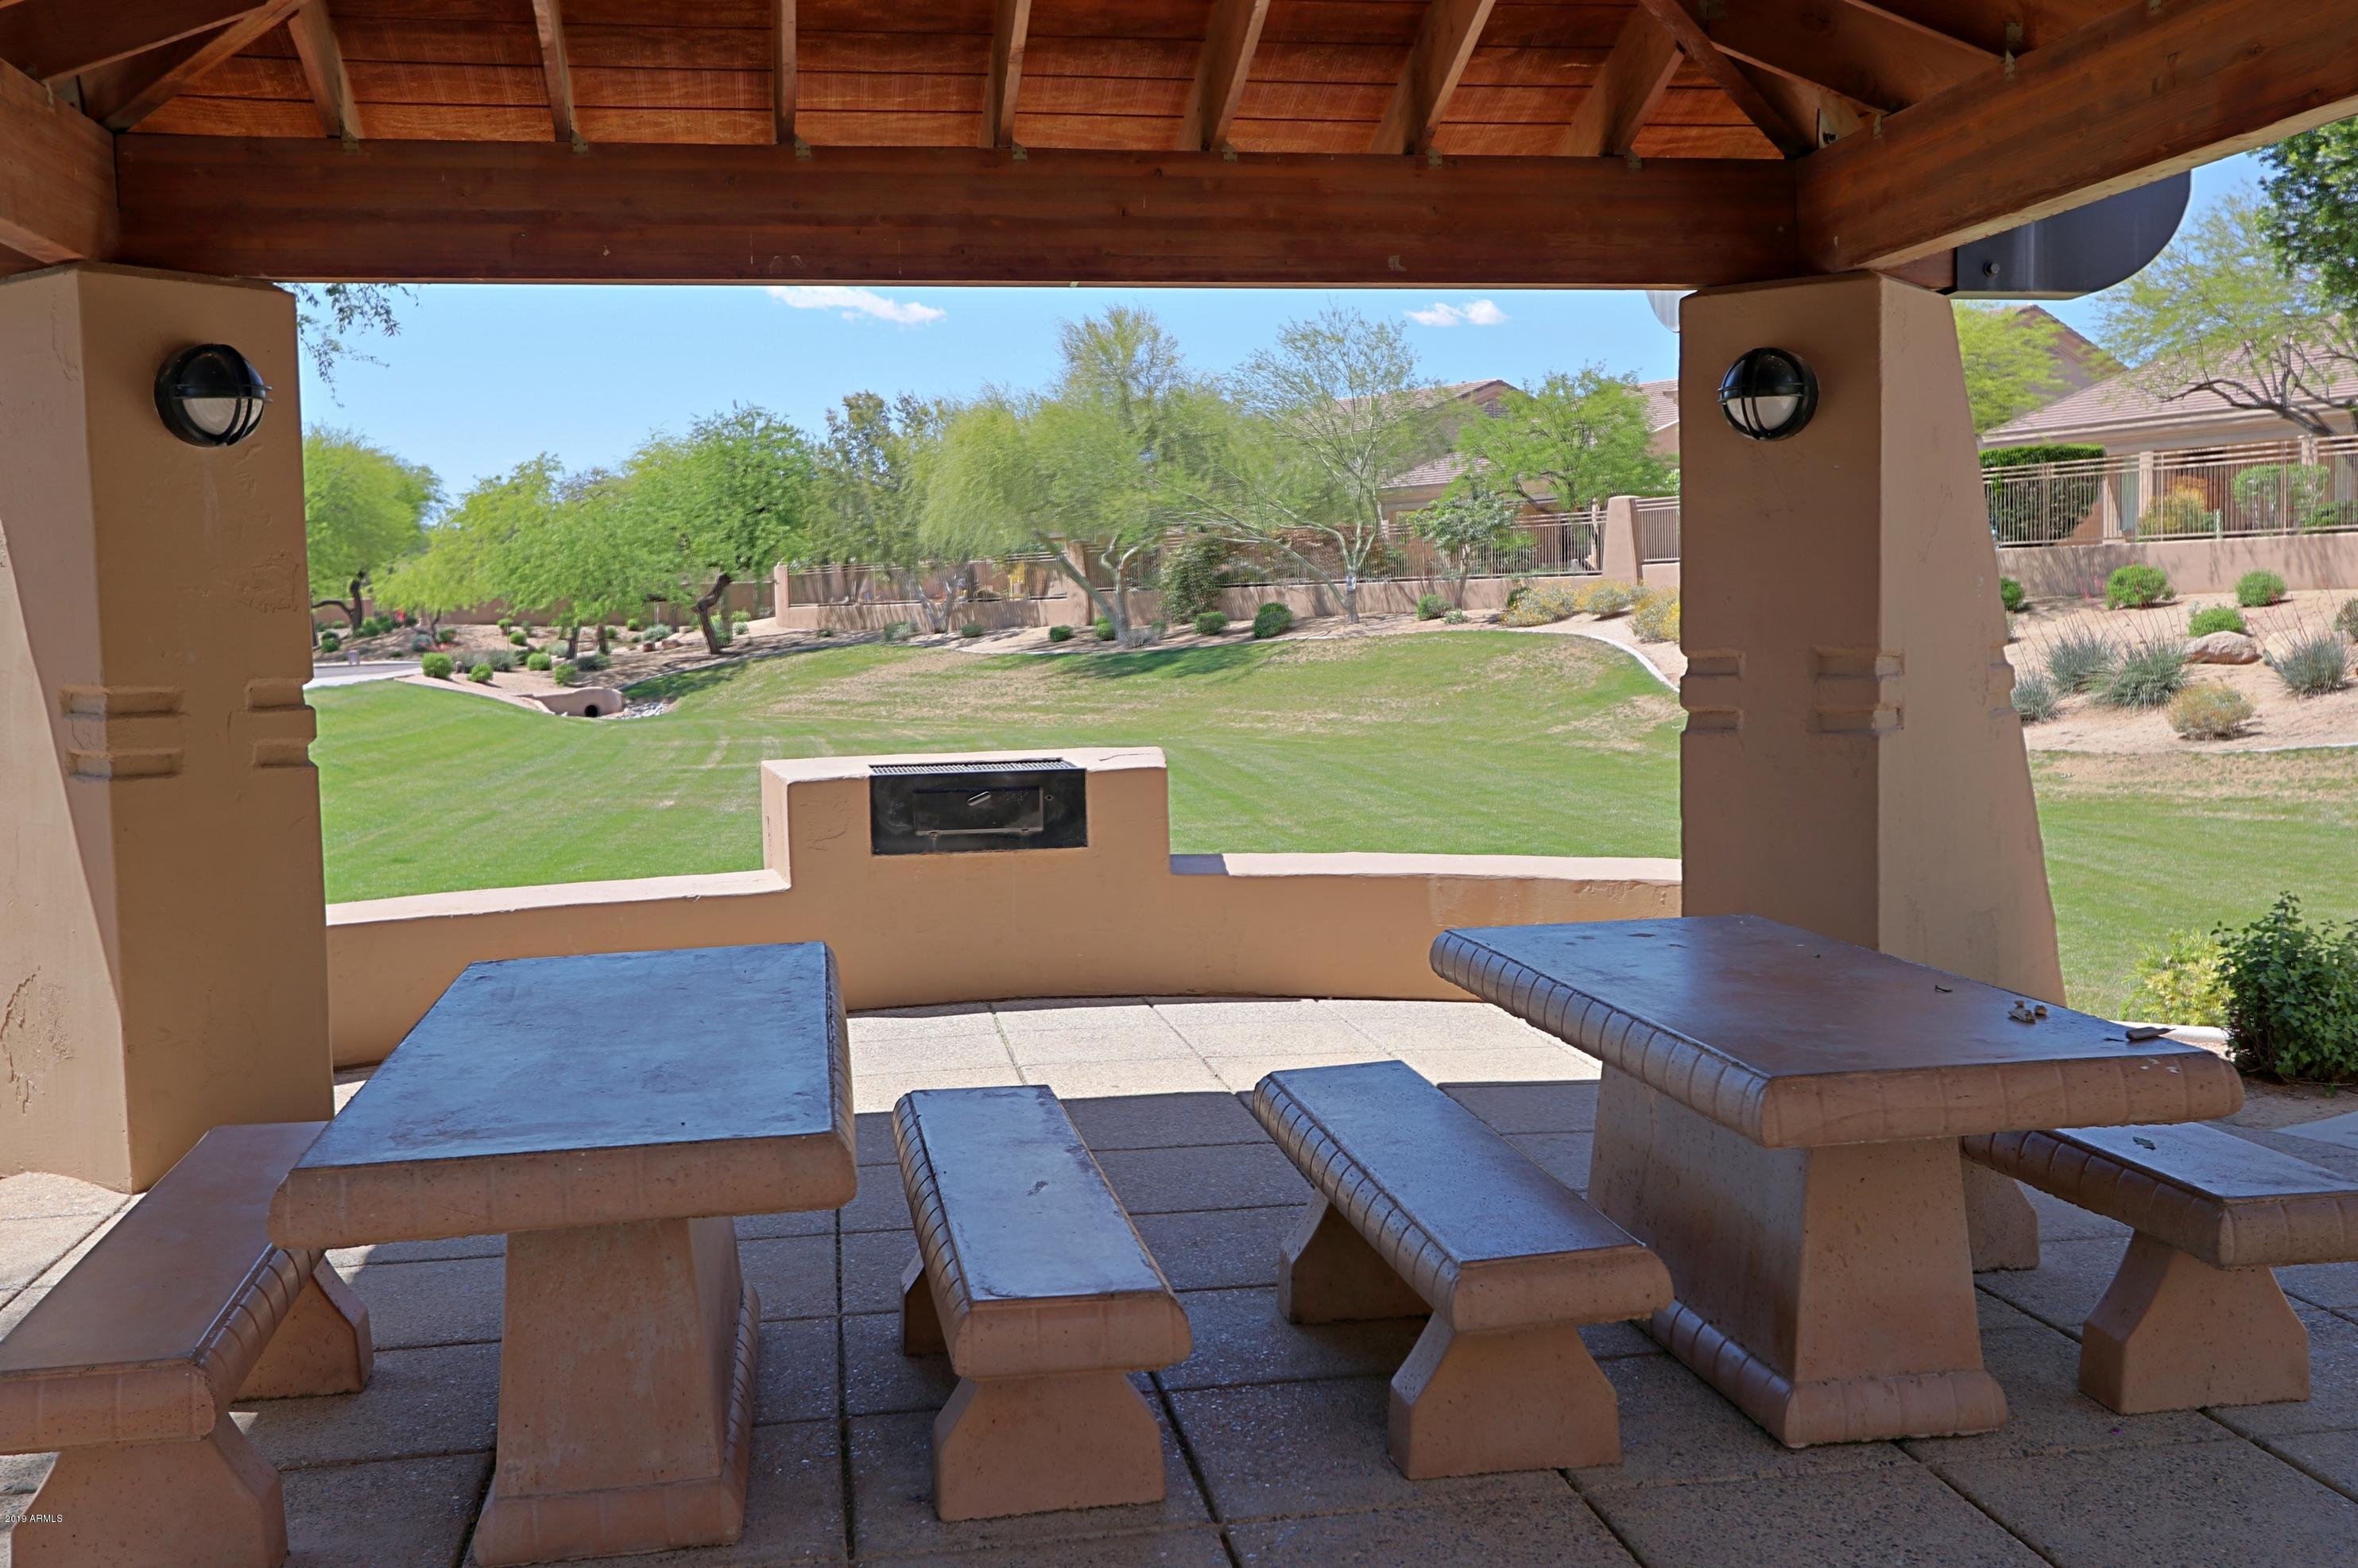 MLS 5920968 7583 E NESTLING Way, Scottsdale, AZ 85255 Scottsdale AZ Private Pool